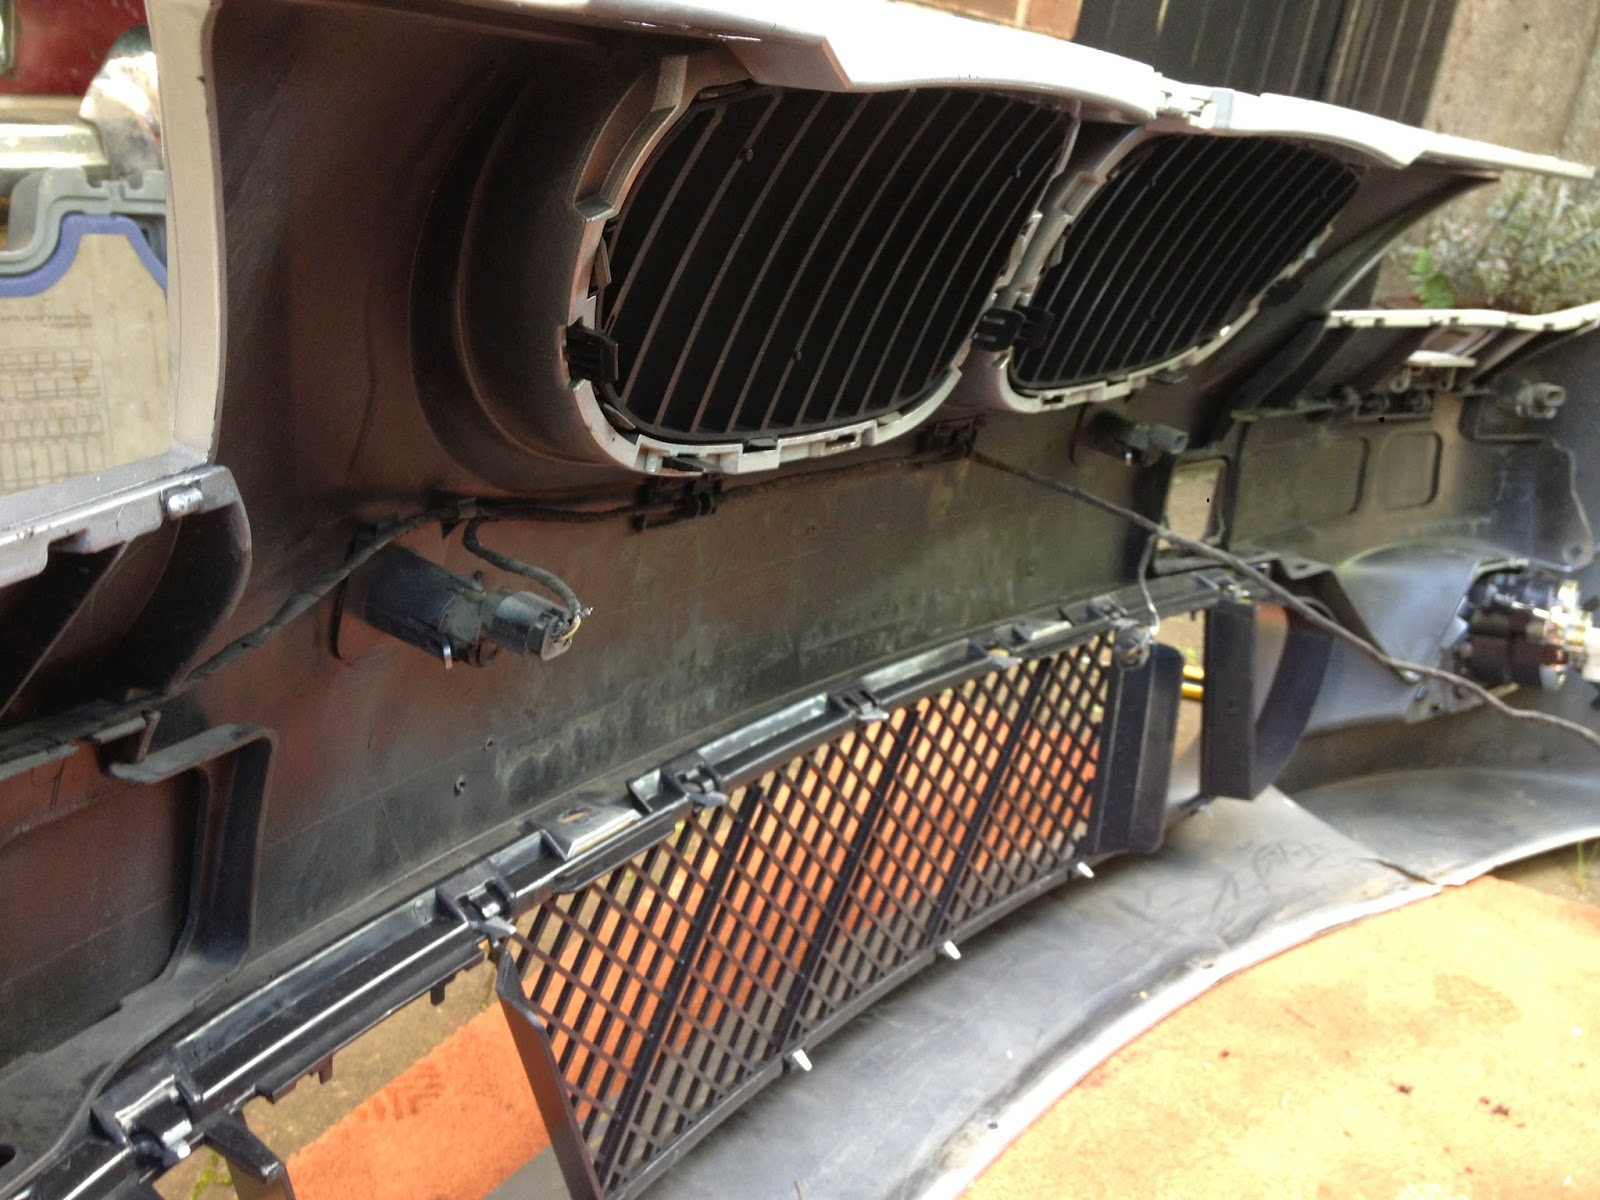 Beemer lab e60 fitting m sport front bumper for Mercedes benz installing parking sensors aftermarket